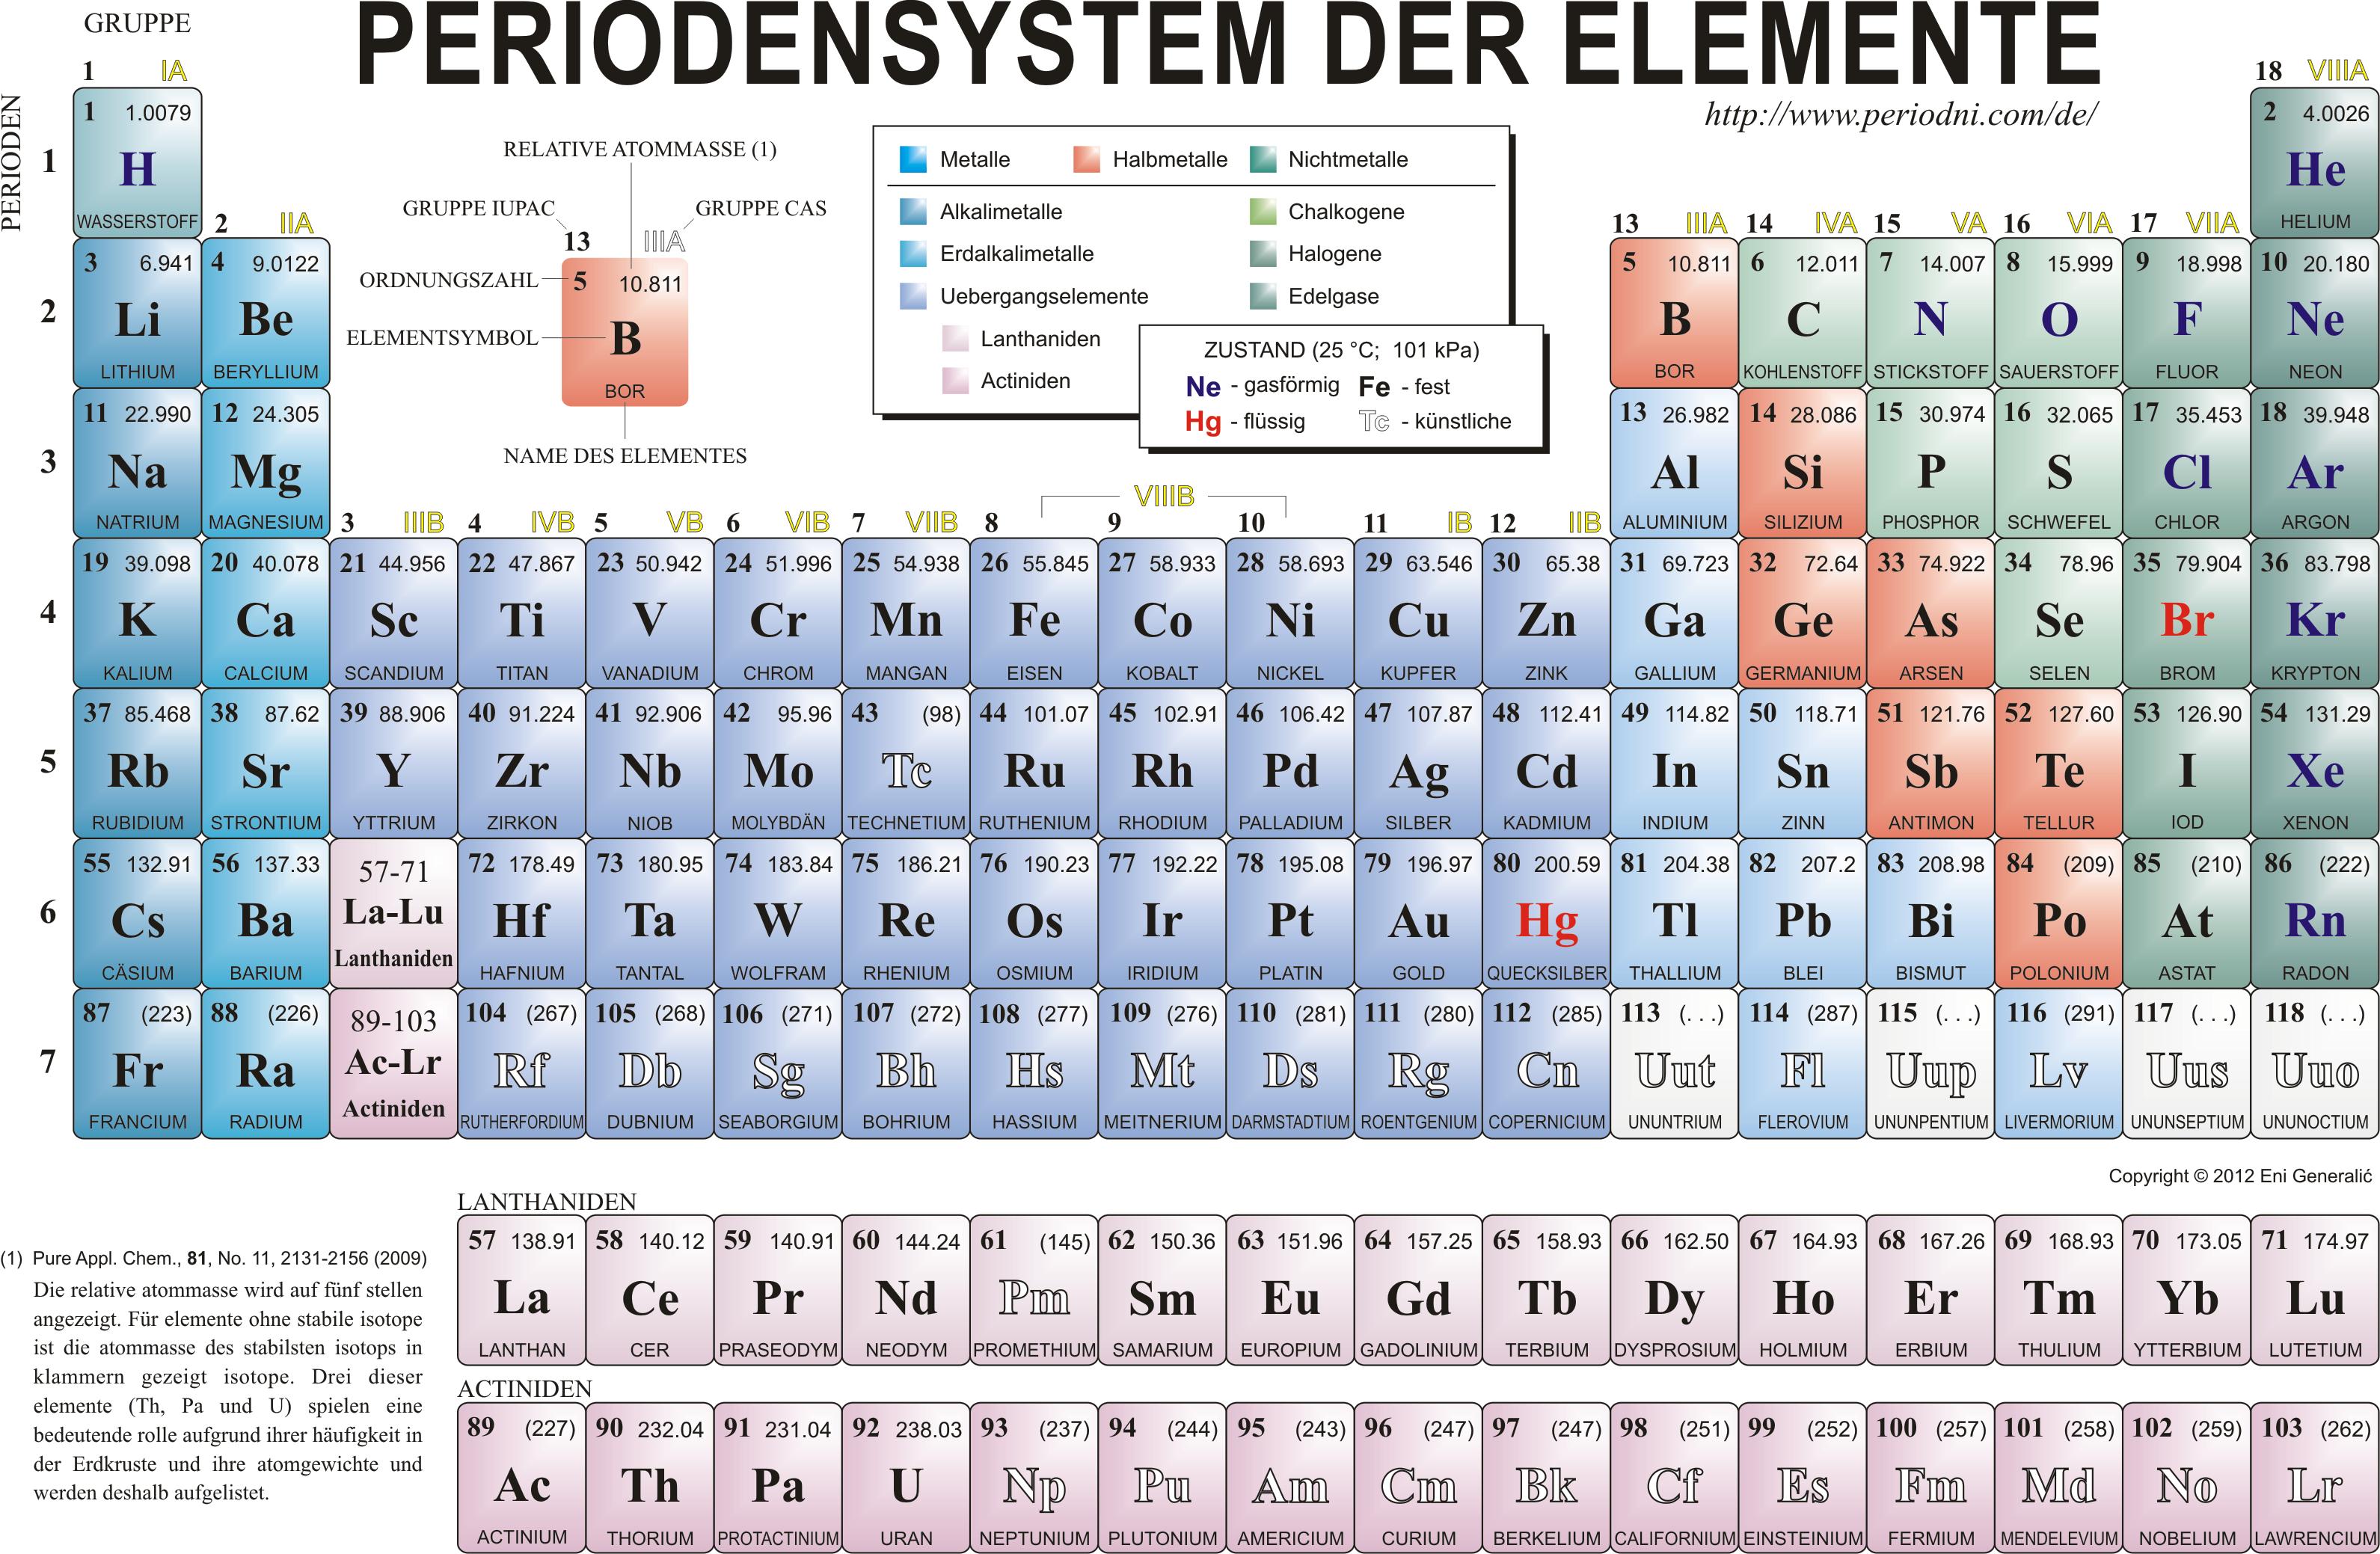 periodensystem der elemente | INFOgraphic | Pinterest ...